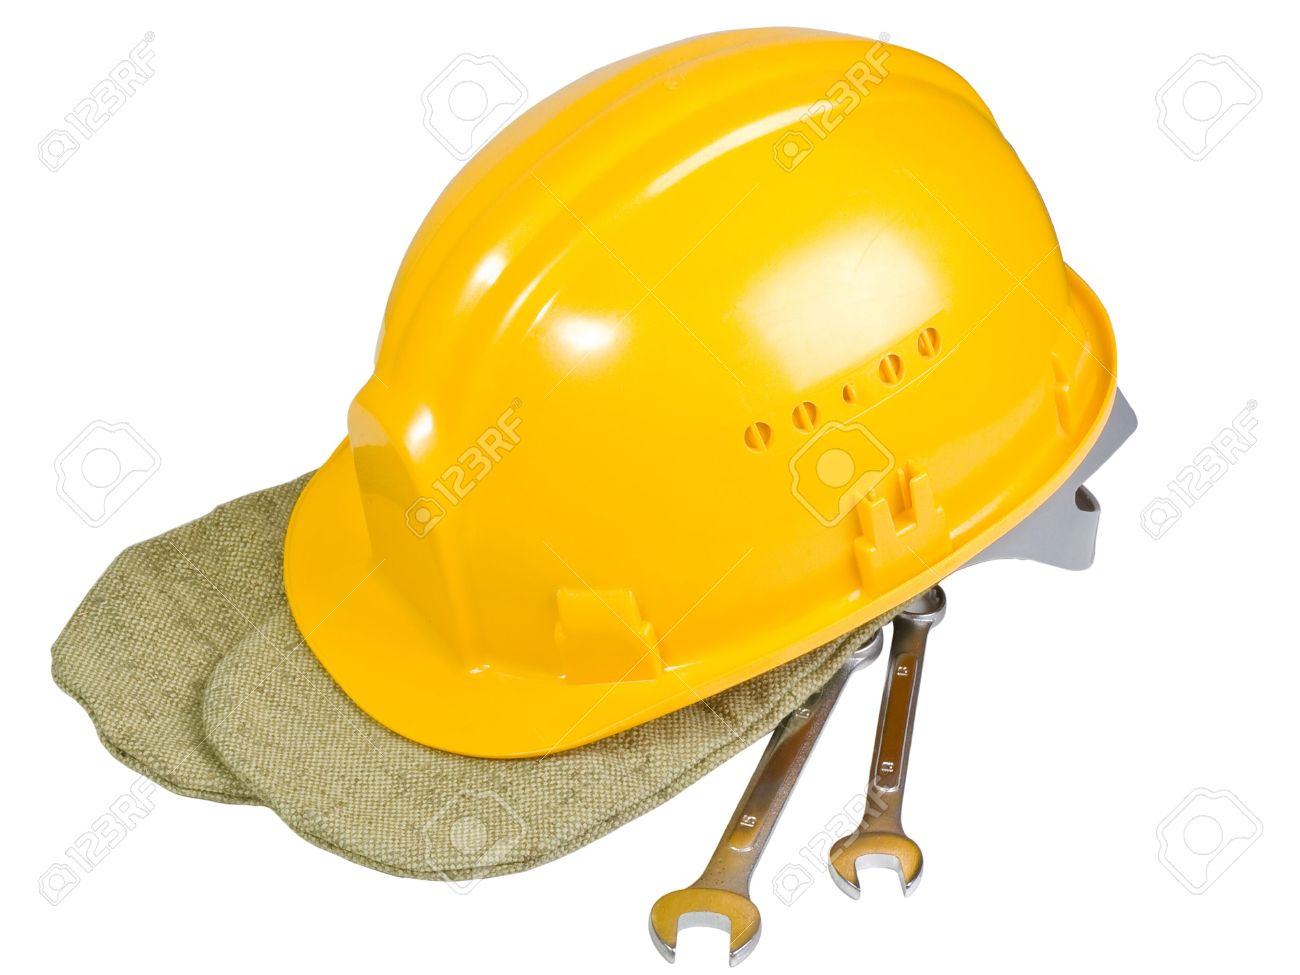 Yellow helmet, mittens, instrument for work Stock Photo - 4674529